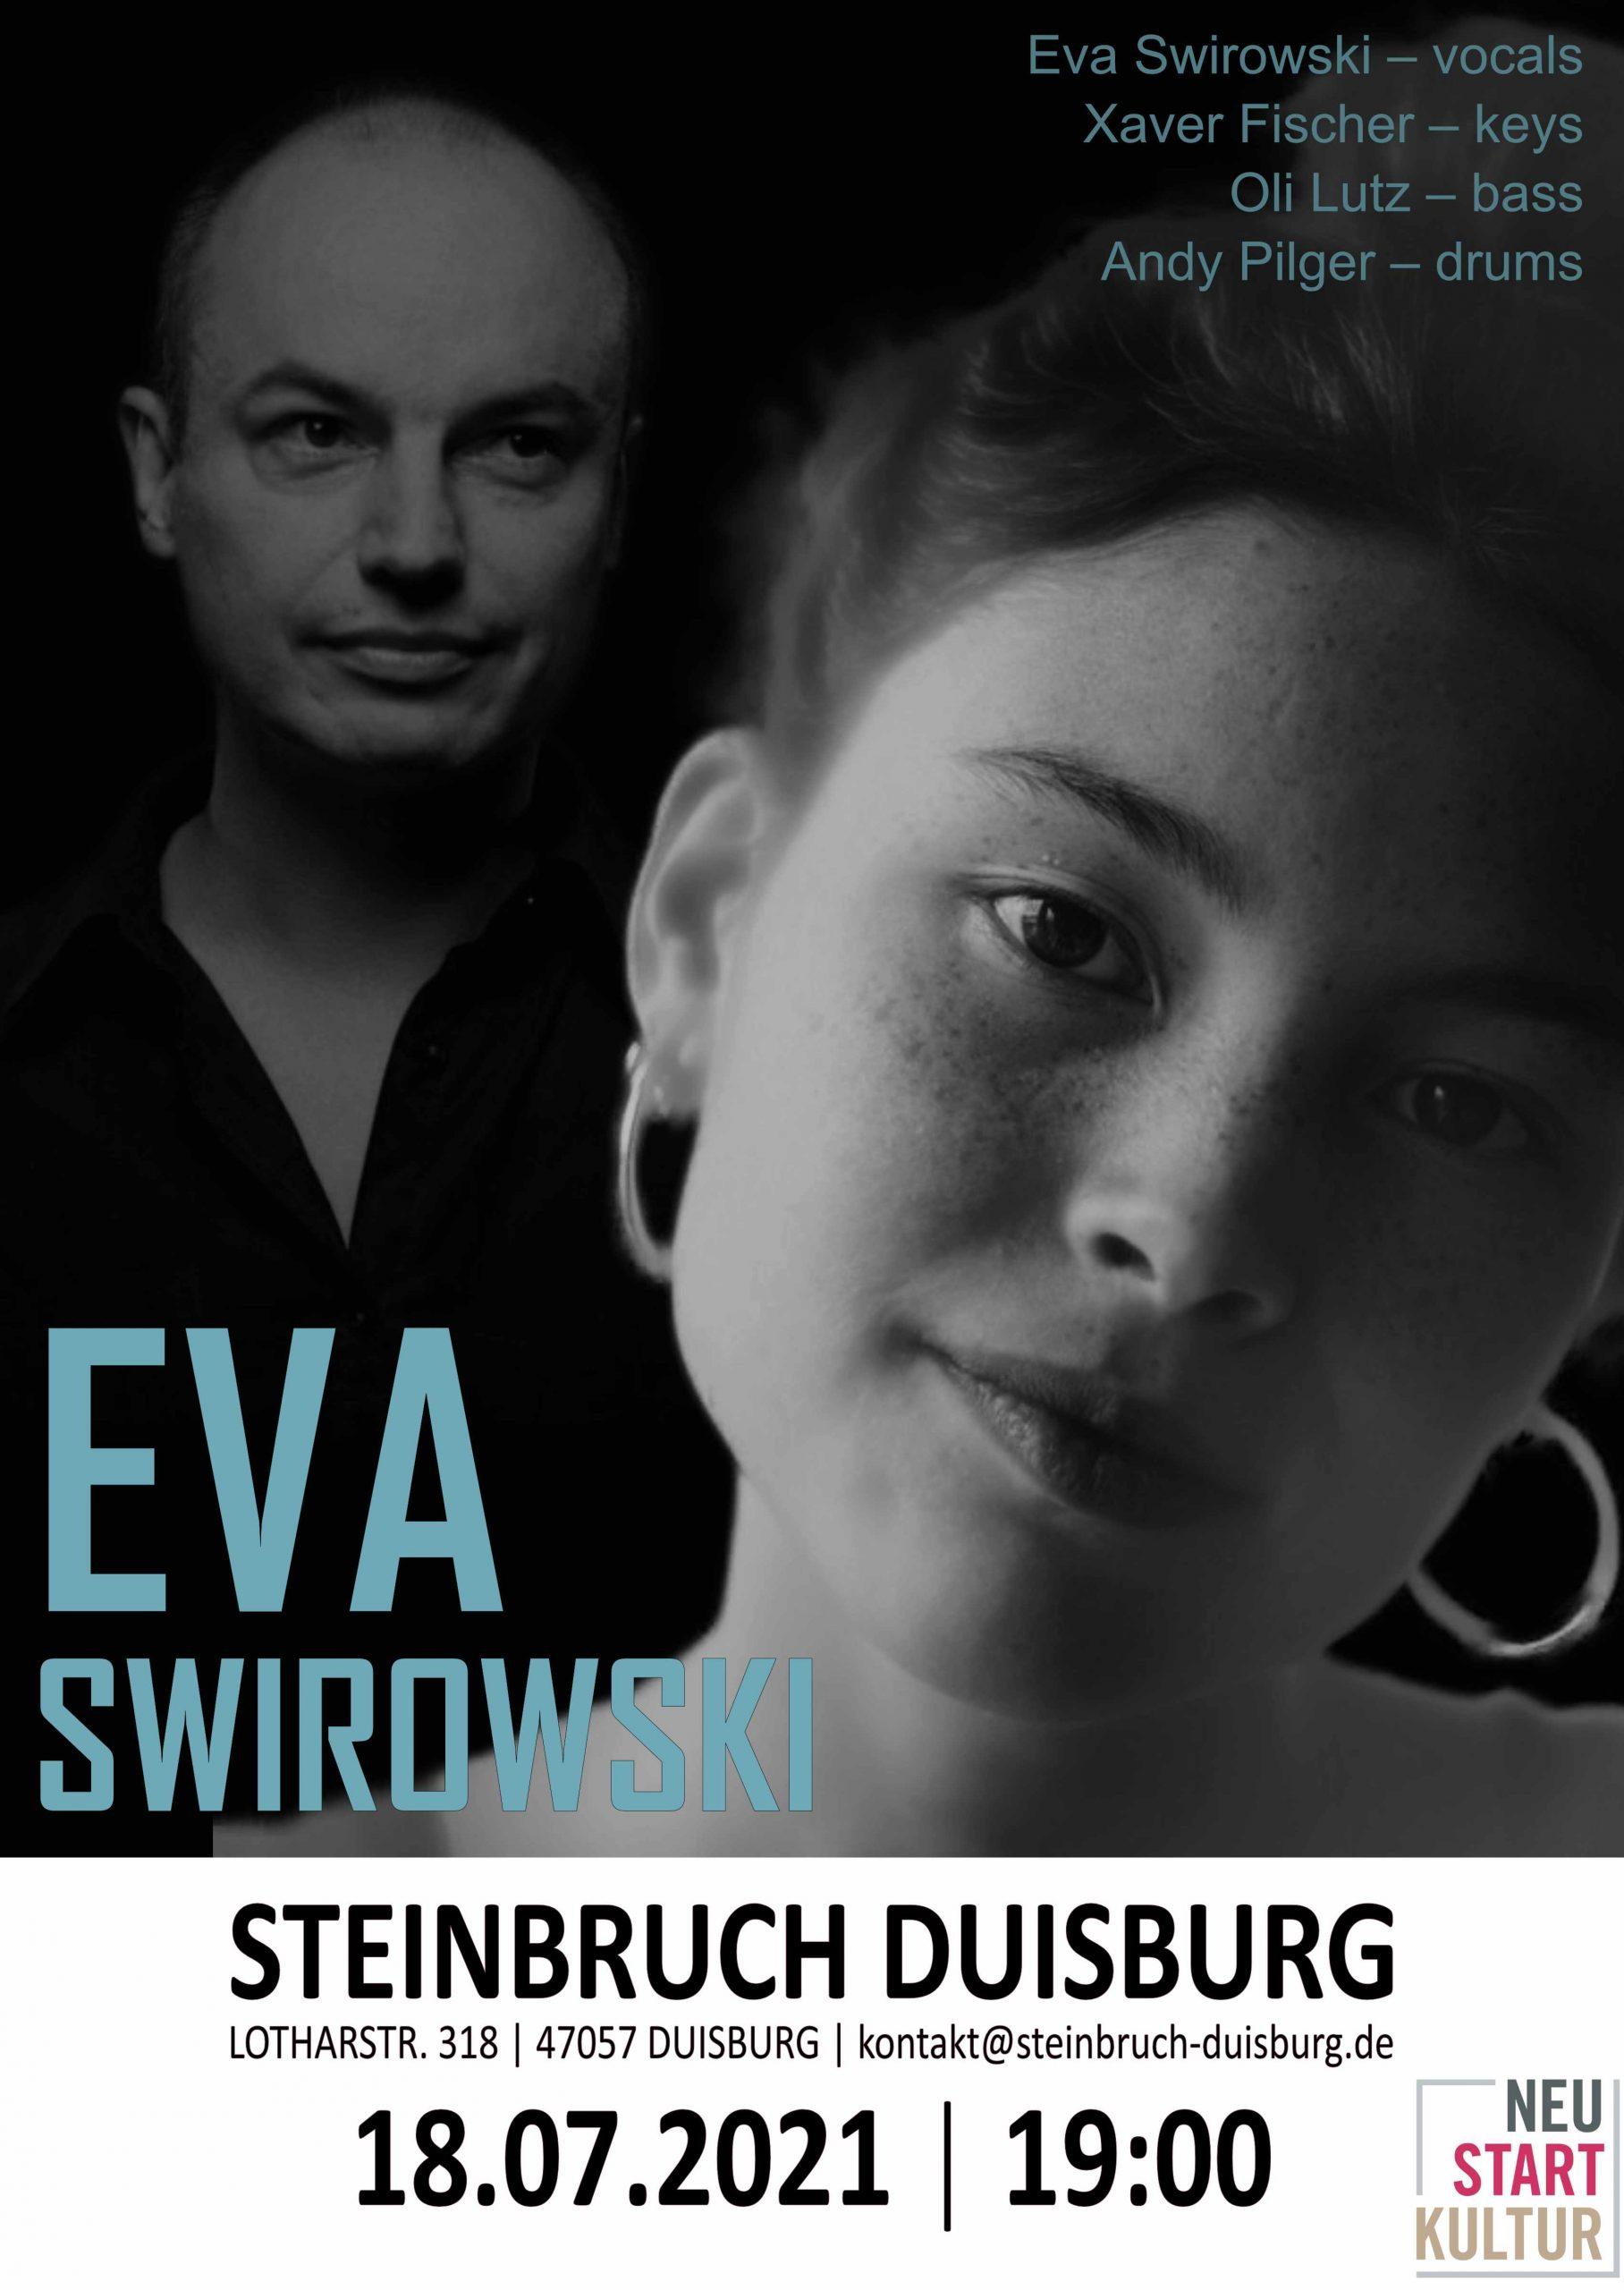 Eva Swirowski